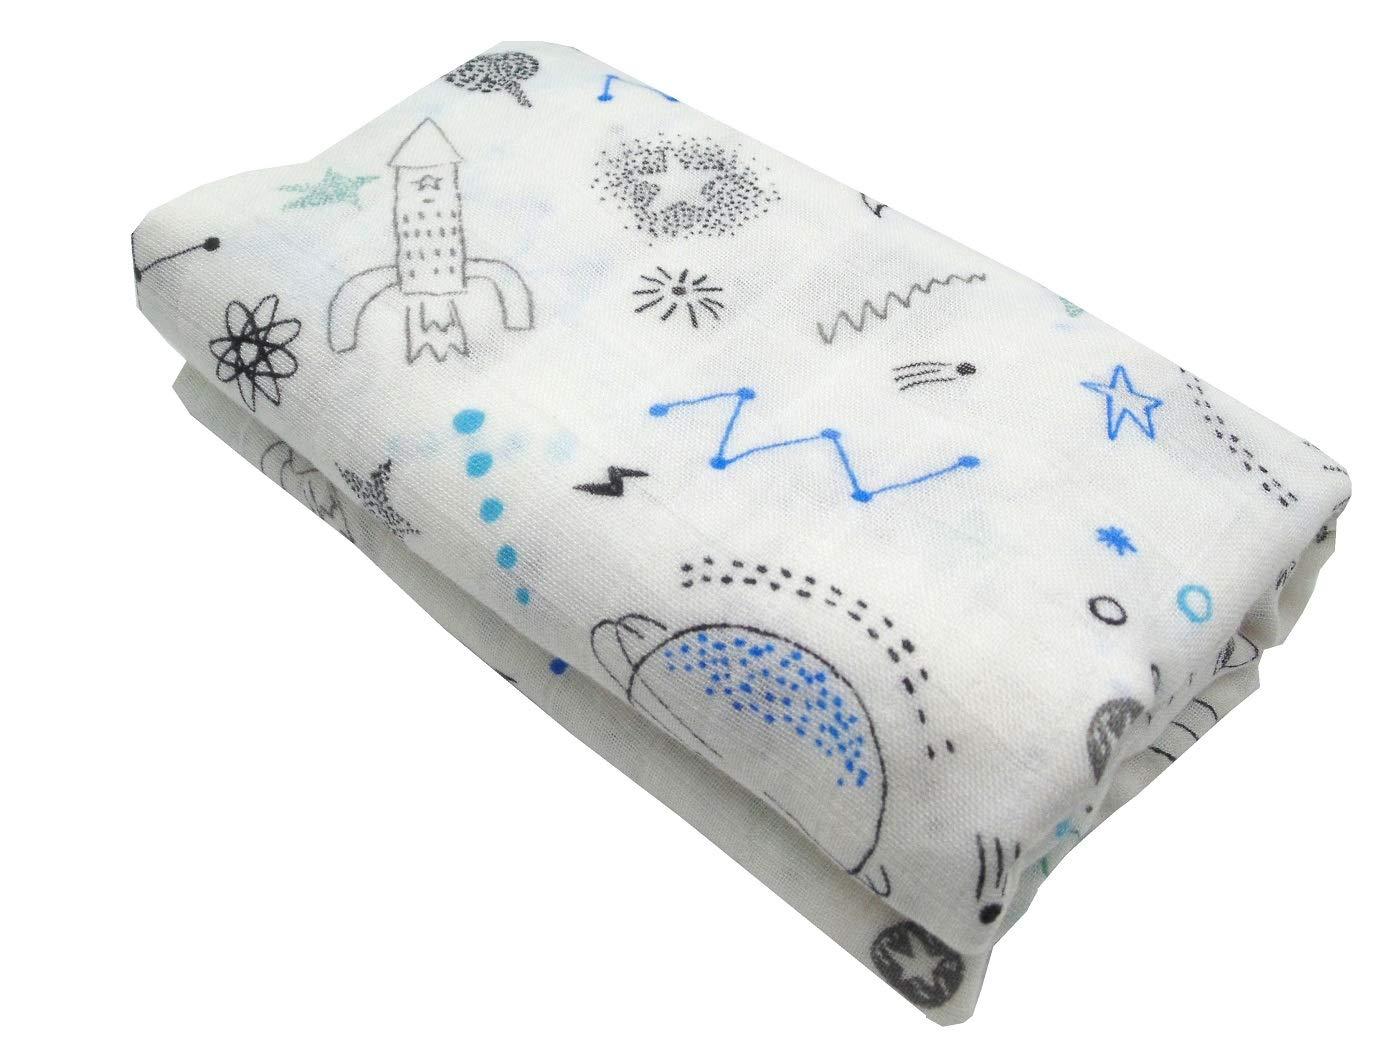 HGHG Bamboo Muslin Baby Blankets Bedding Infant Swaddle Towel Multifunctional Envelopes Baby Dinosaur Print 47x47